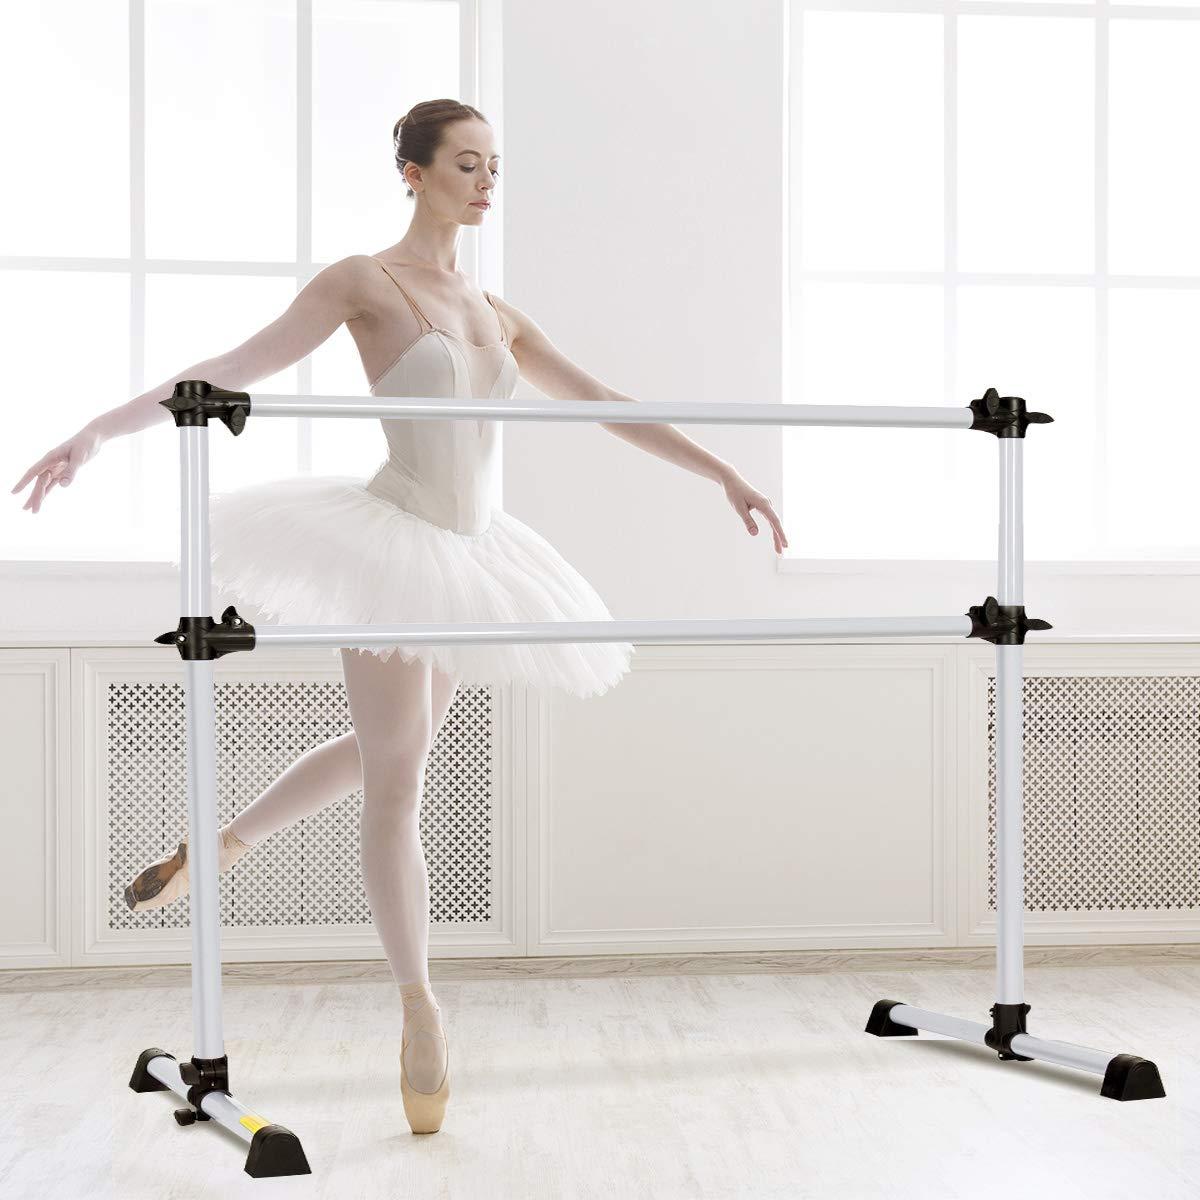 Costway Double Ballet Barre Gymnastics Bar Stretch Bar Portable Freestanding Dance Exercise Equipment 123cm Long 120cm Height